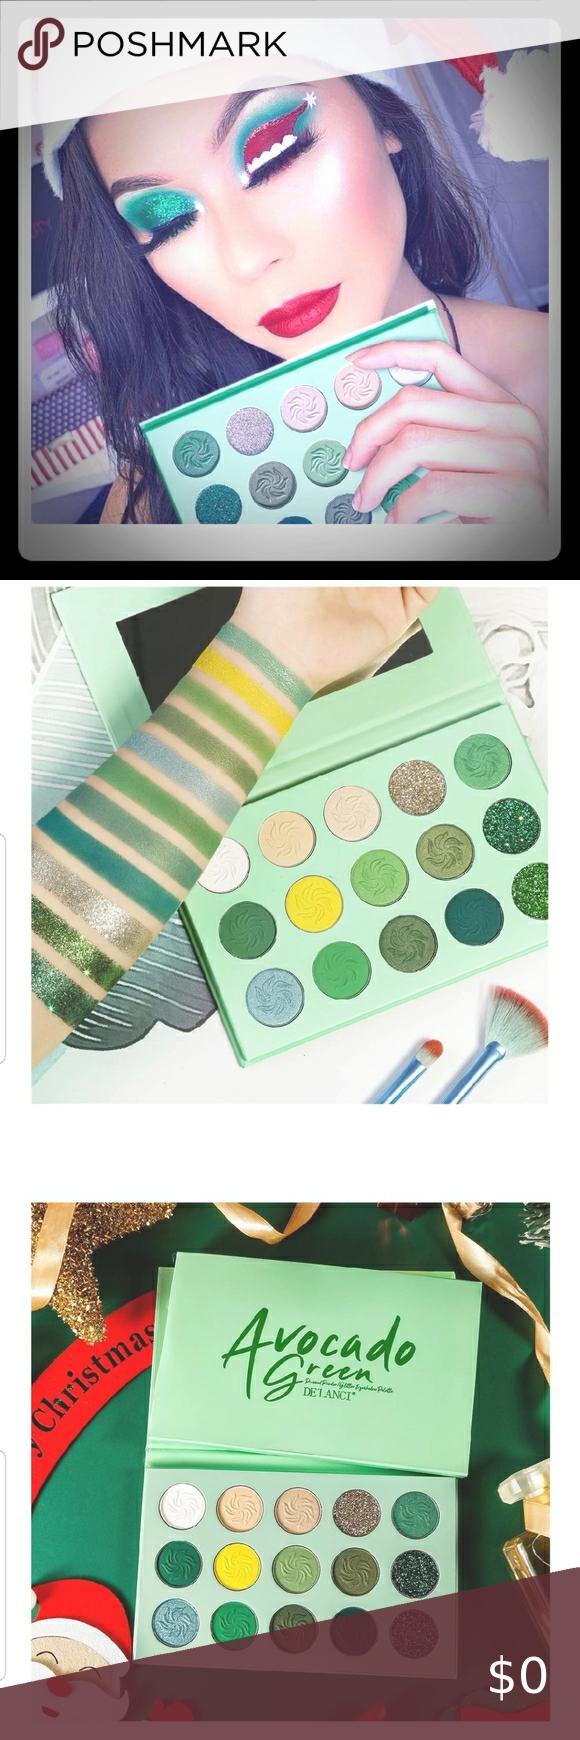 Avocado Green Eyeshadow Palette New....Avocado Green